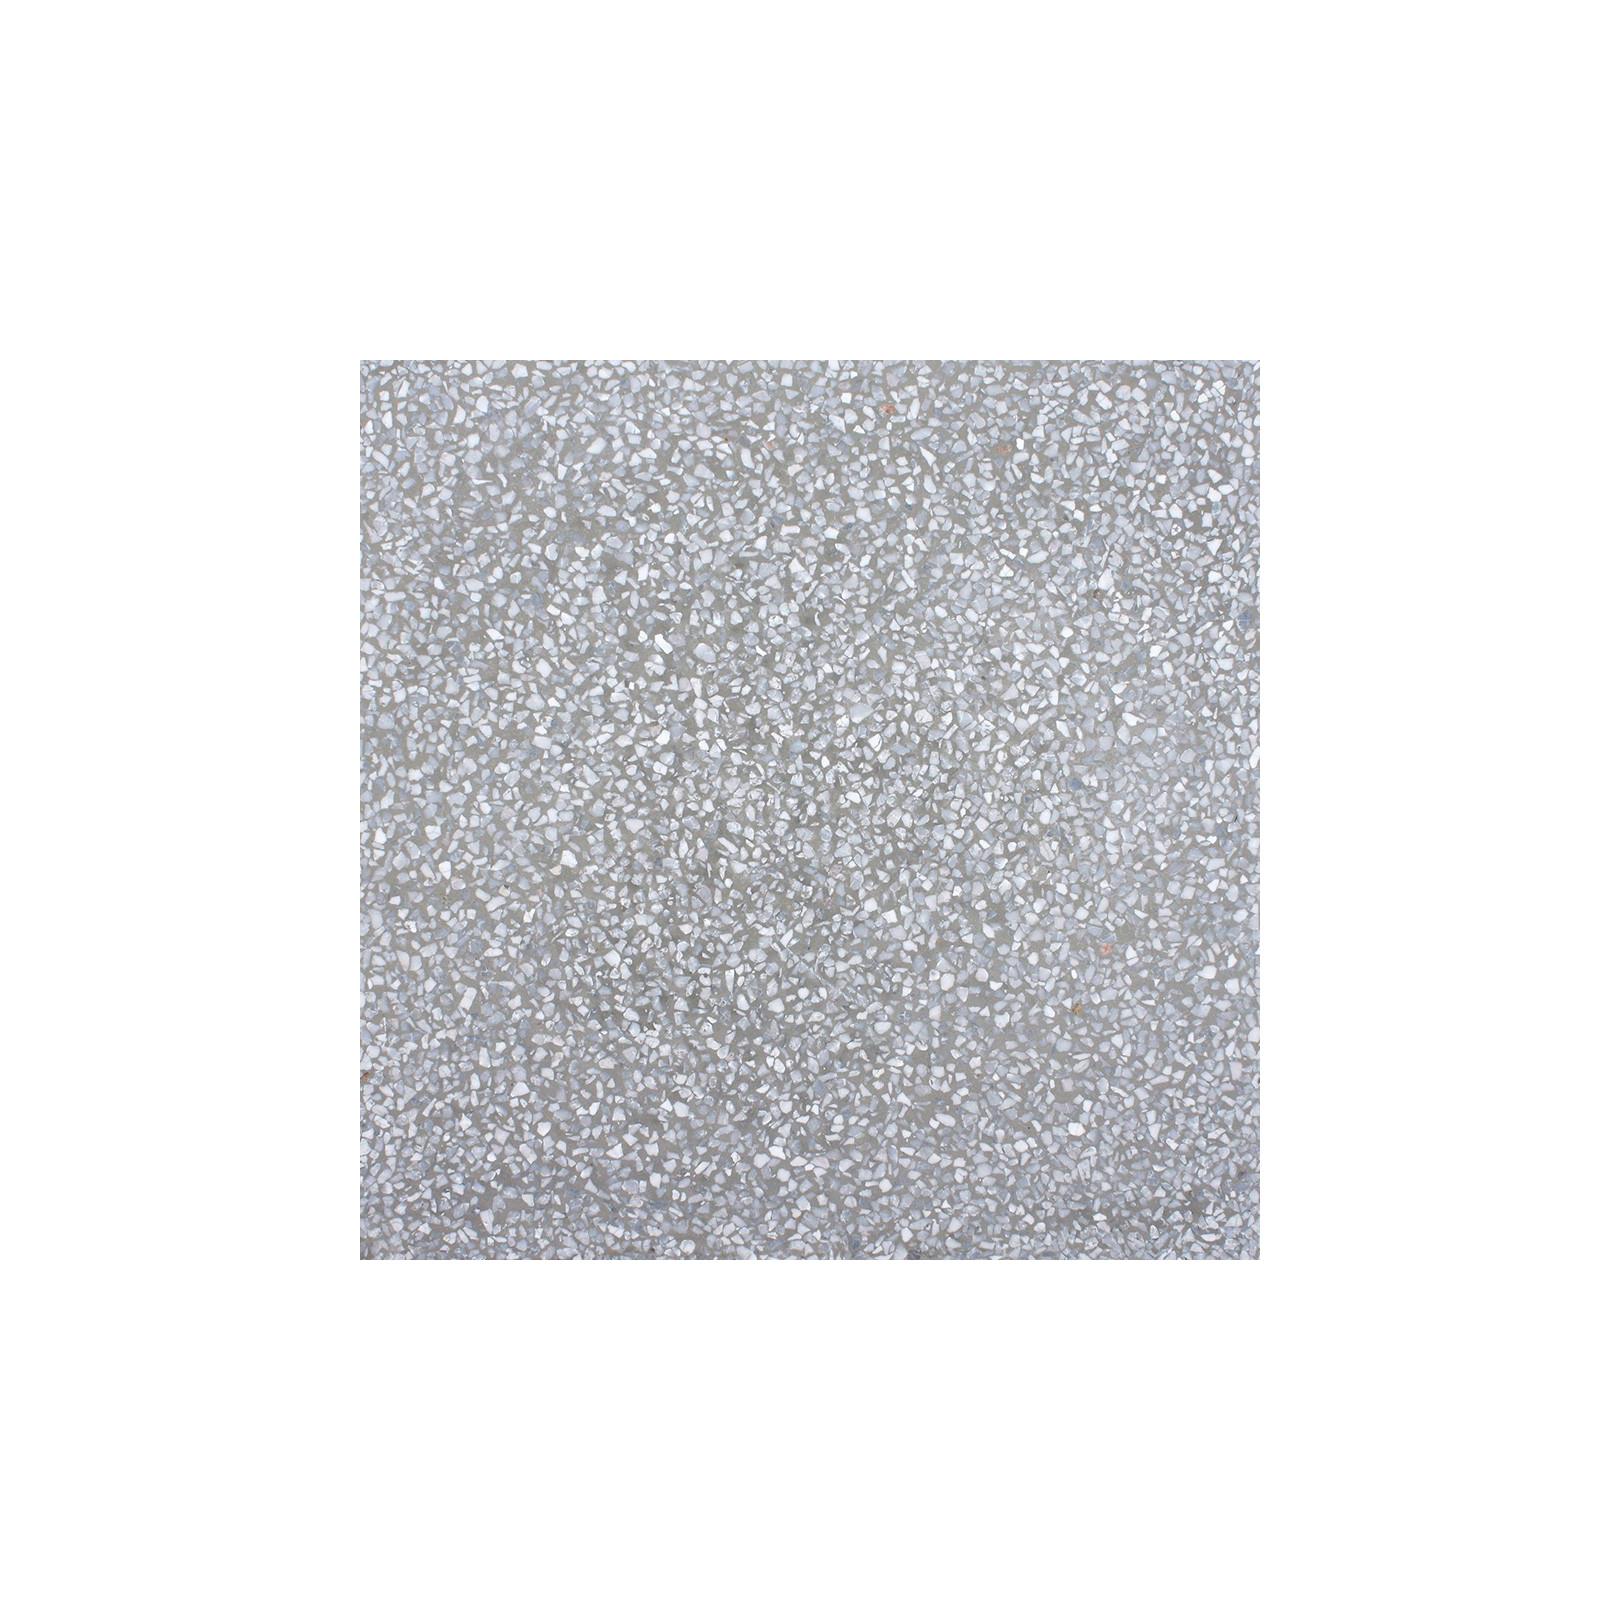 Carreau Terrazzo uni gris TG329, 30x30cm